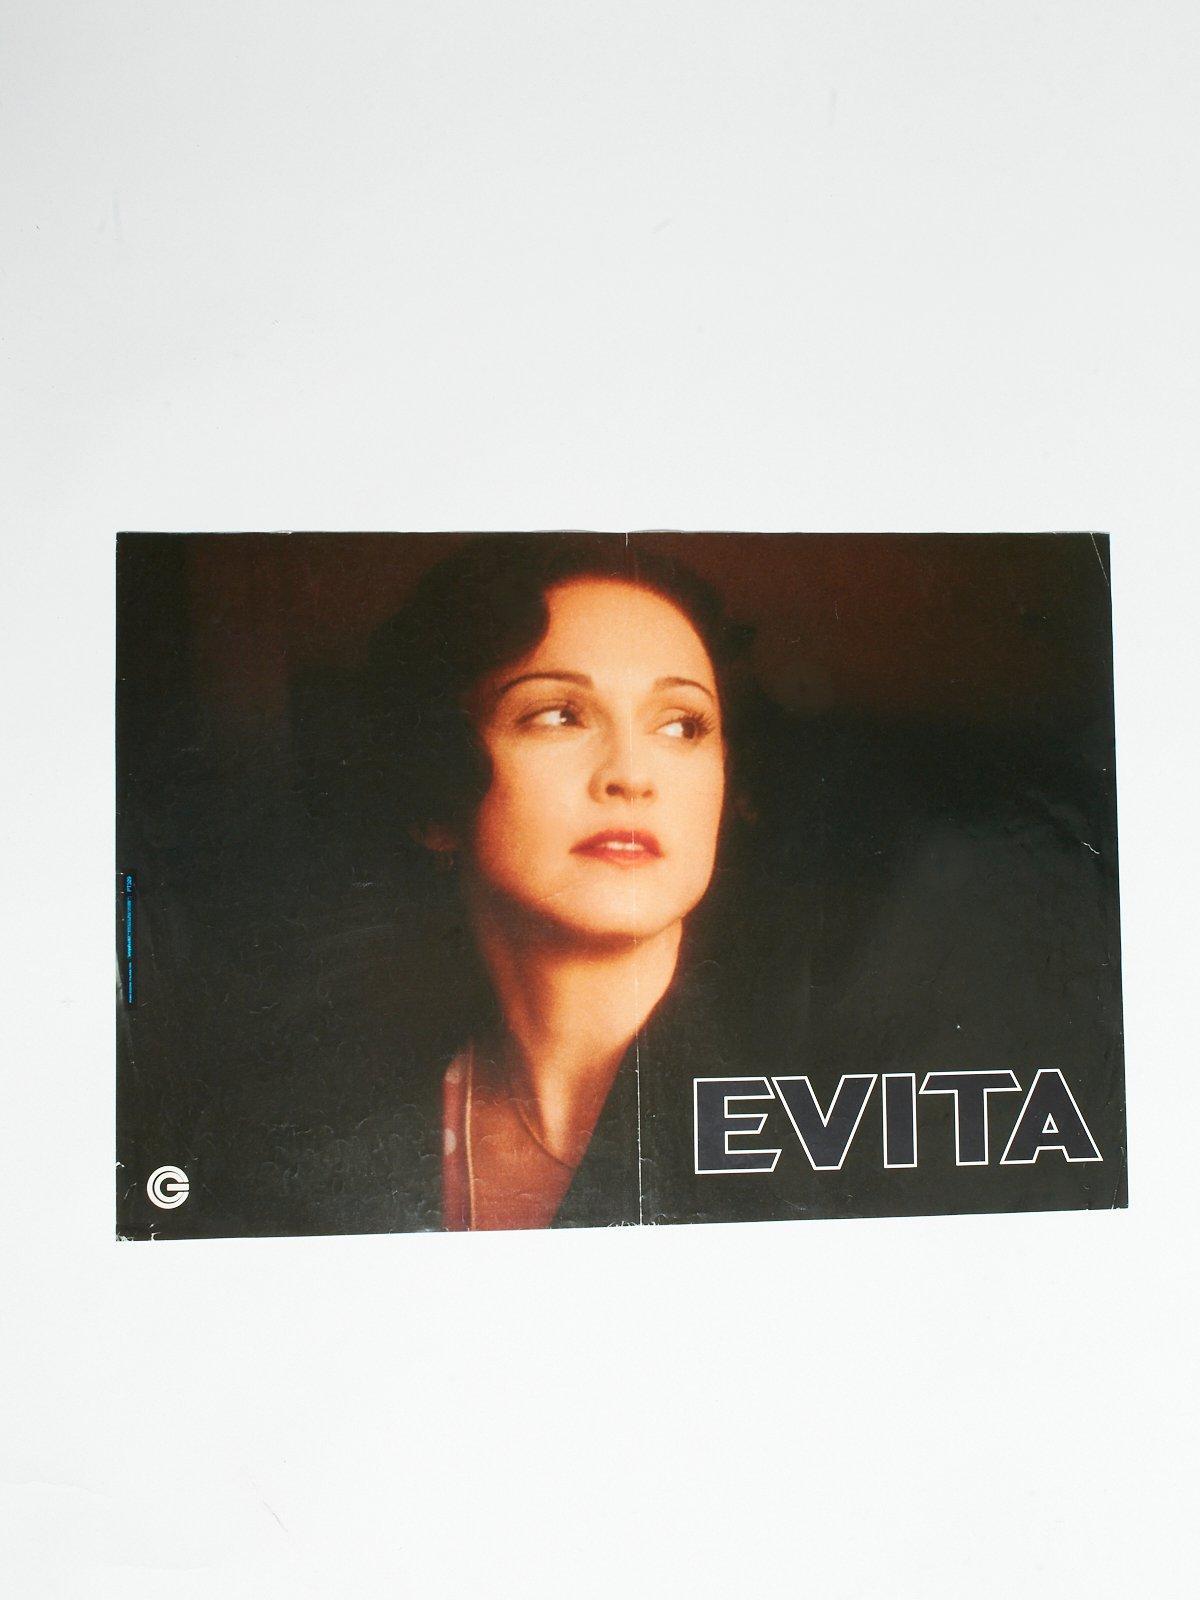 EVITA LOBBY CARD